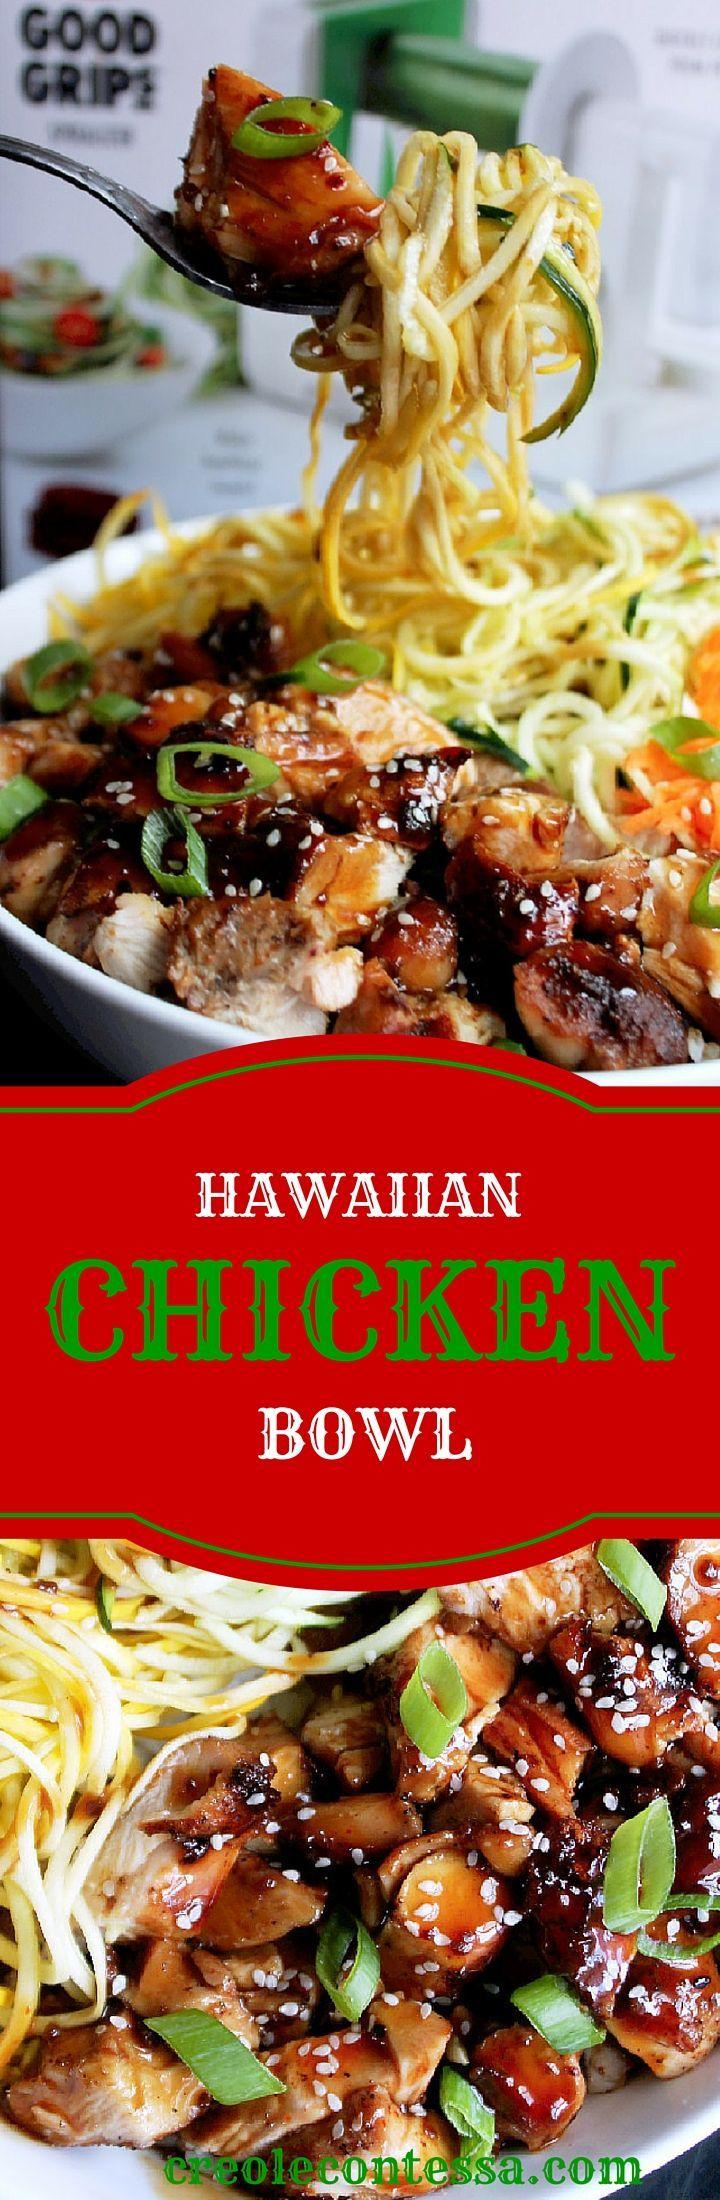 Hawaiian Chicken Bowl